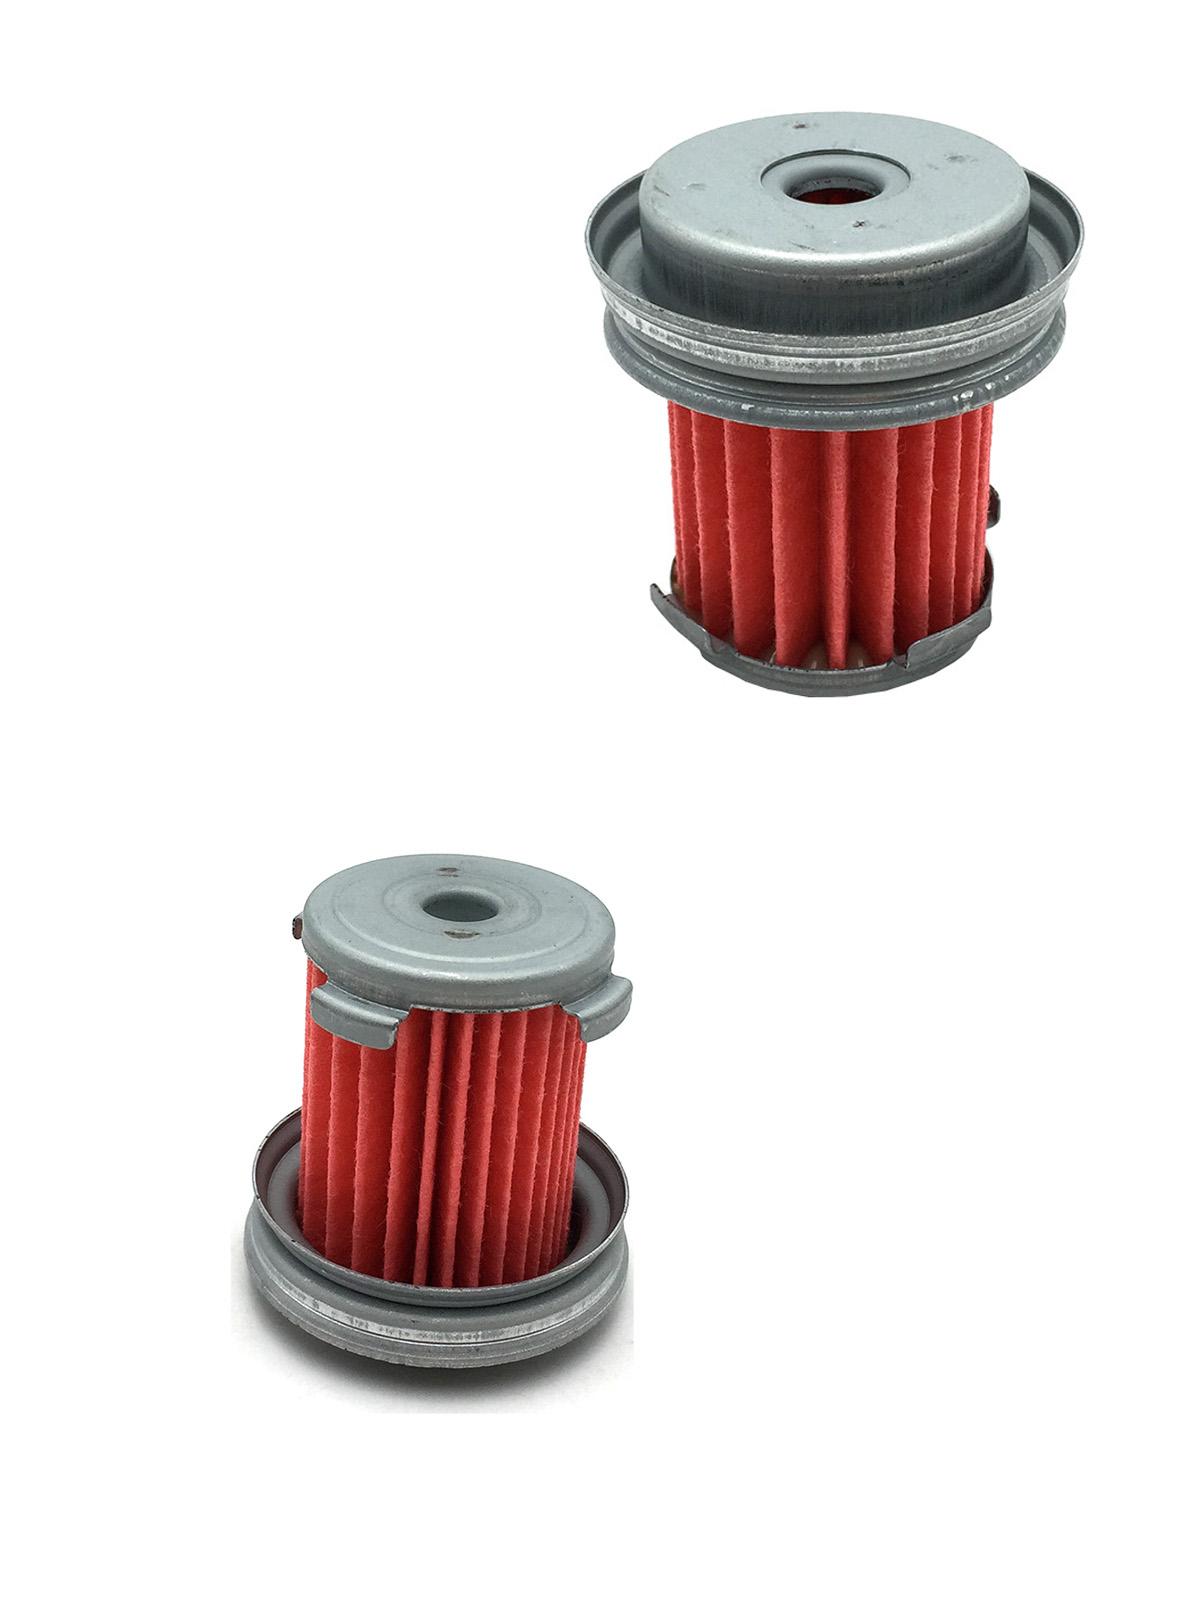 Filtro de Óleo Externo - Câmbio M4VA | SWRA - Honda Fit